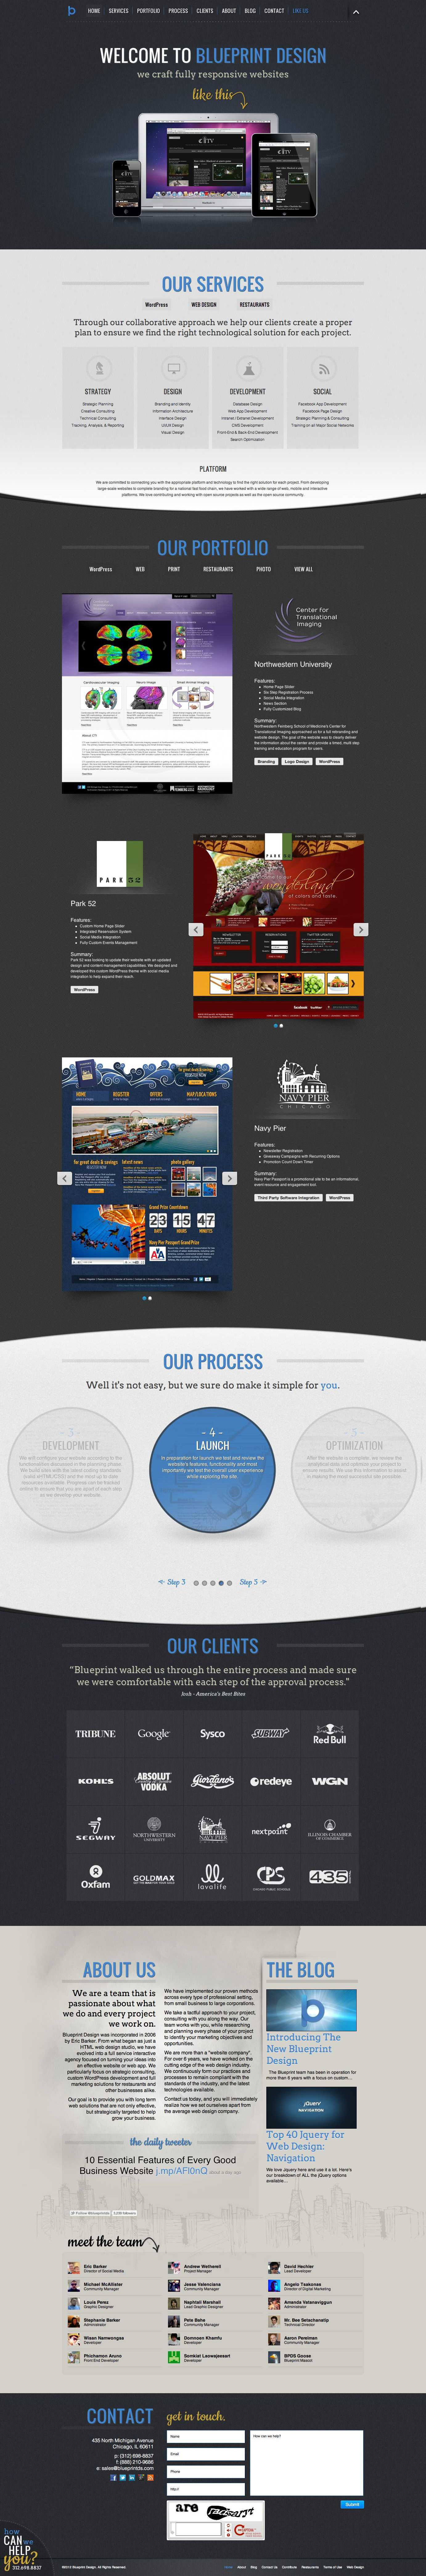 Chicago Web Design Restaurant Menu Design Blueprint Studio Web Design Website Design Css Templates